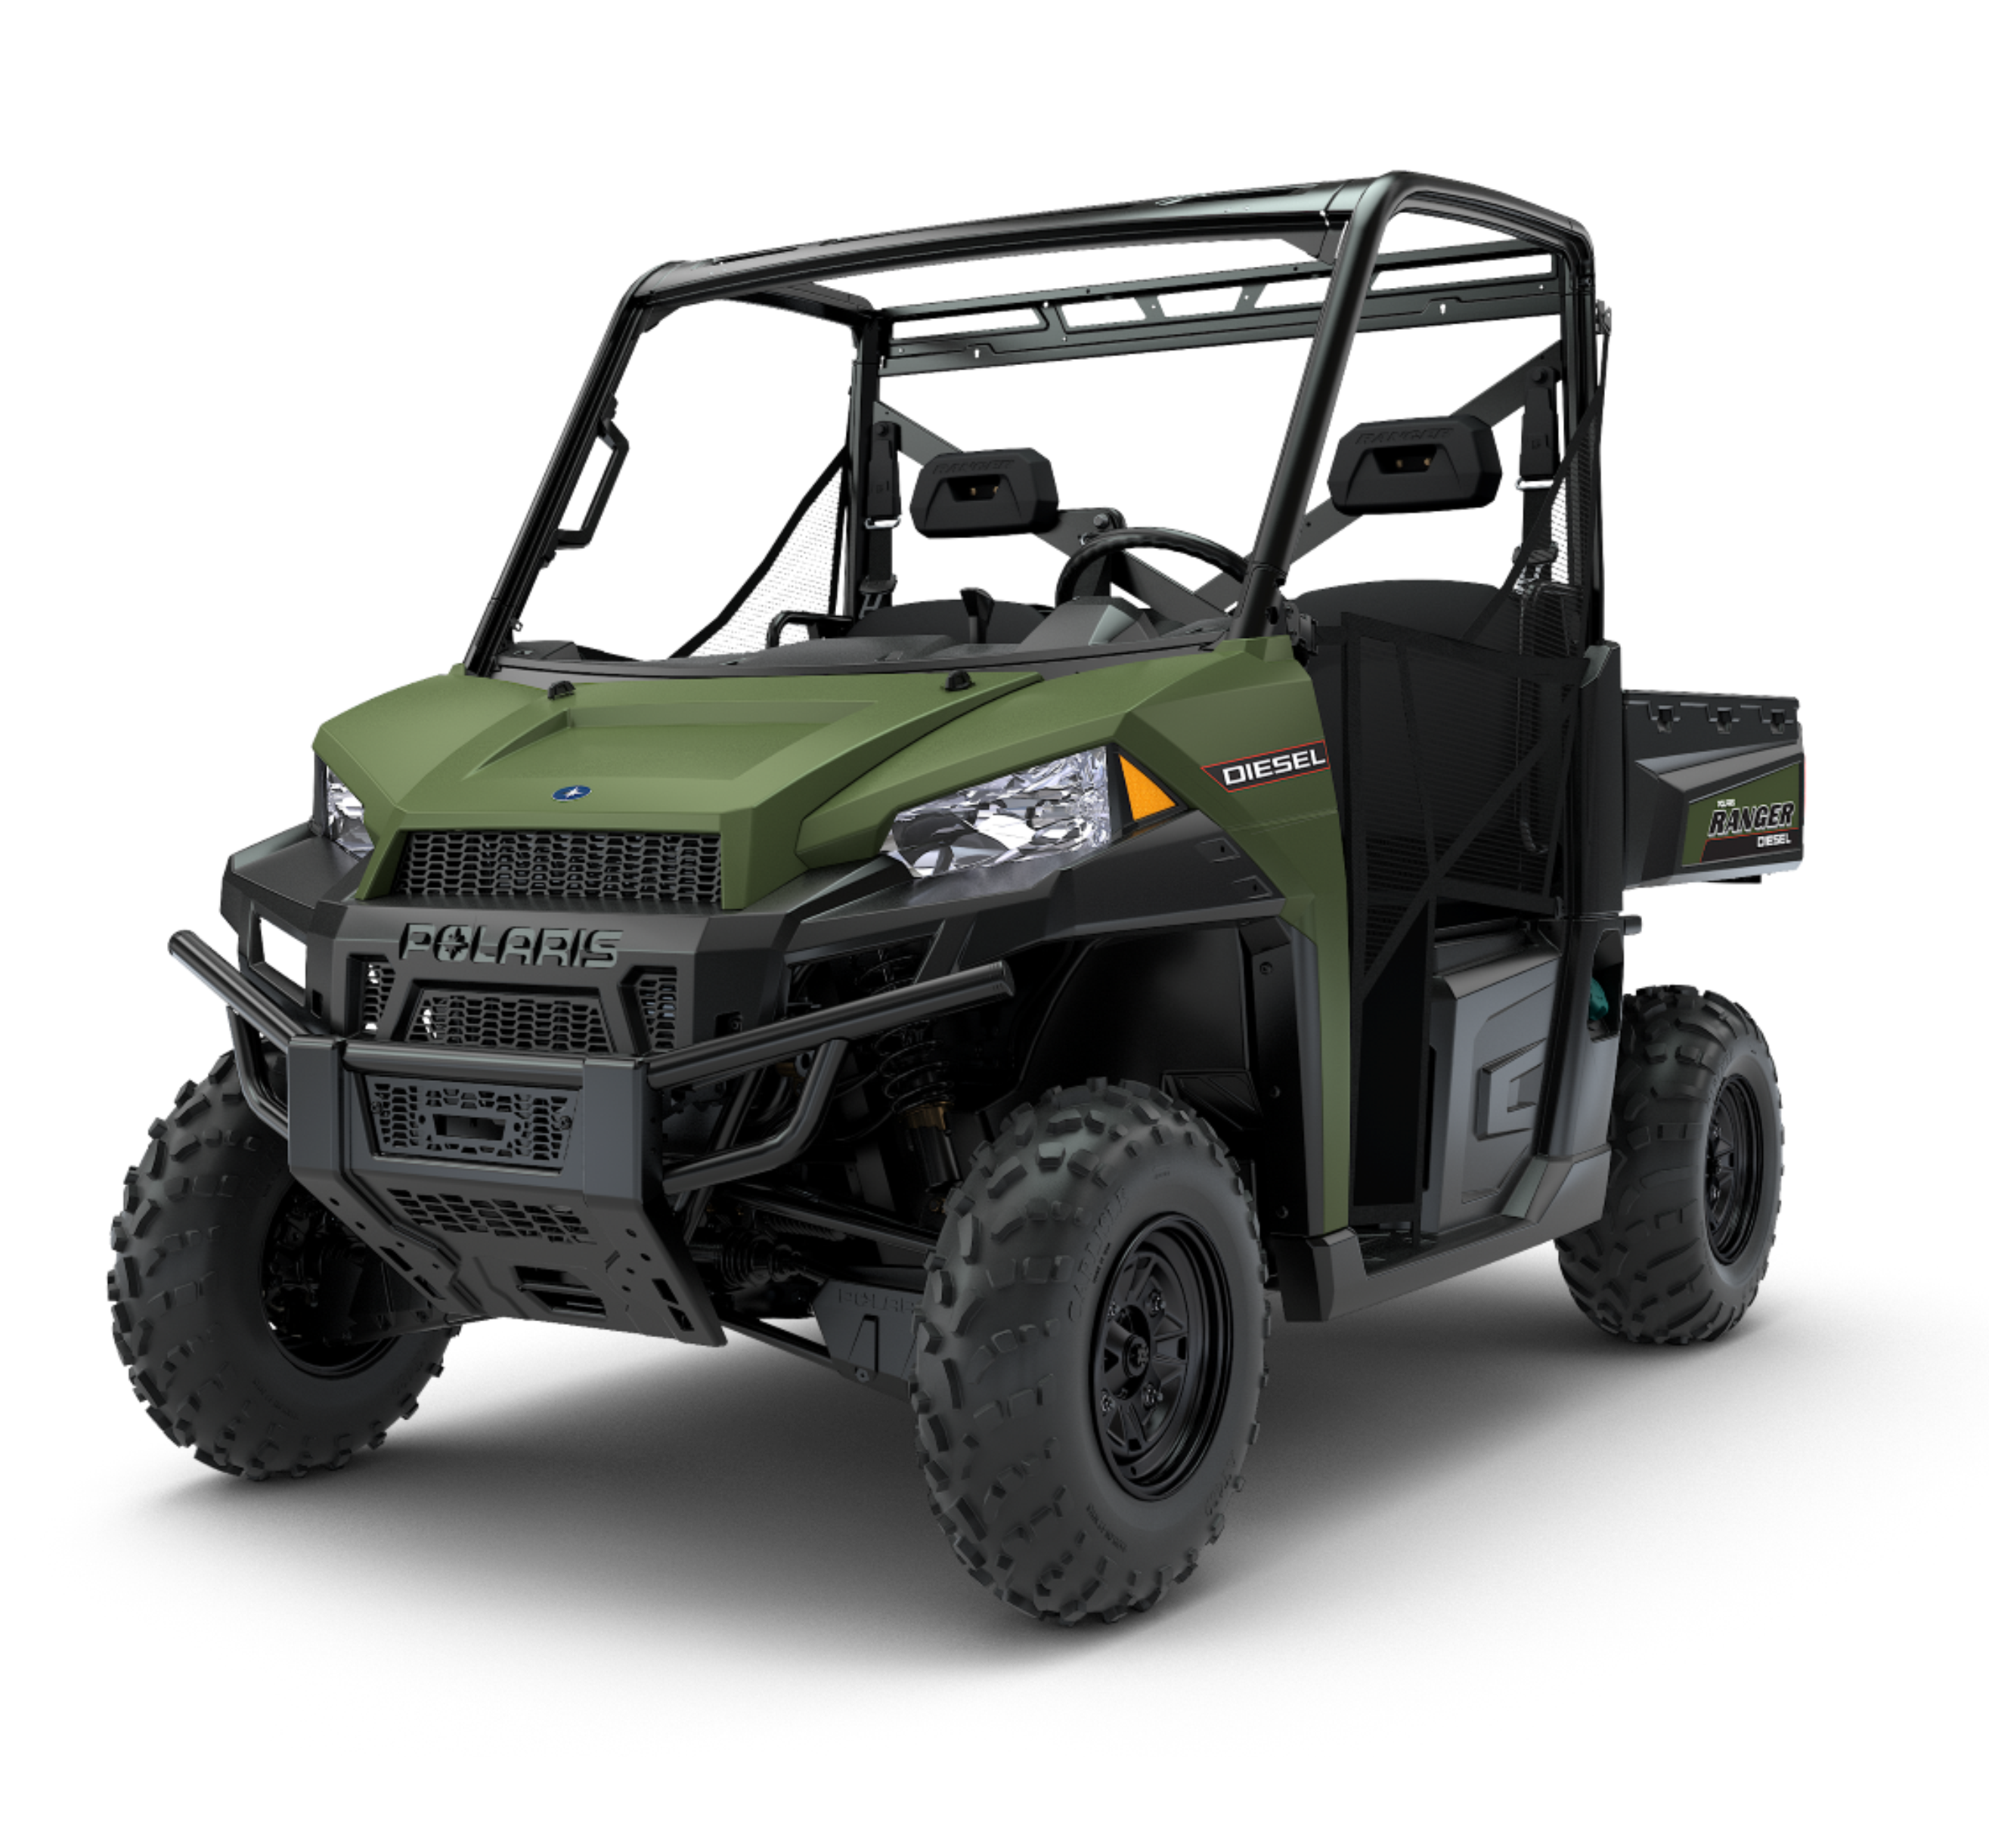 Polaris Ranger Diesel >> Polaris Ranger Diesel Hd Moorland Atv